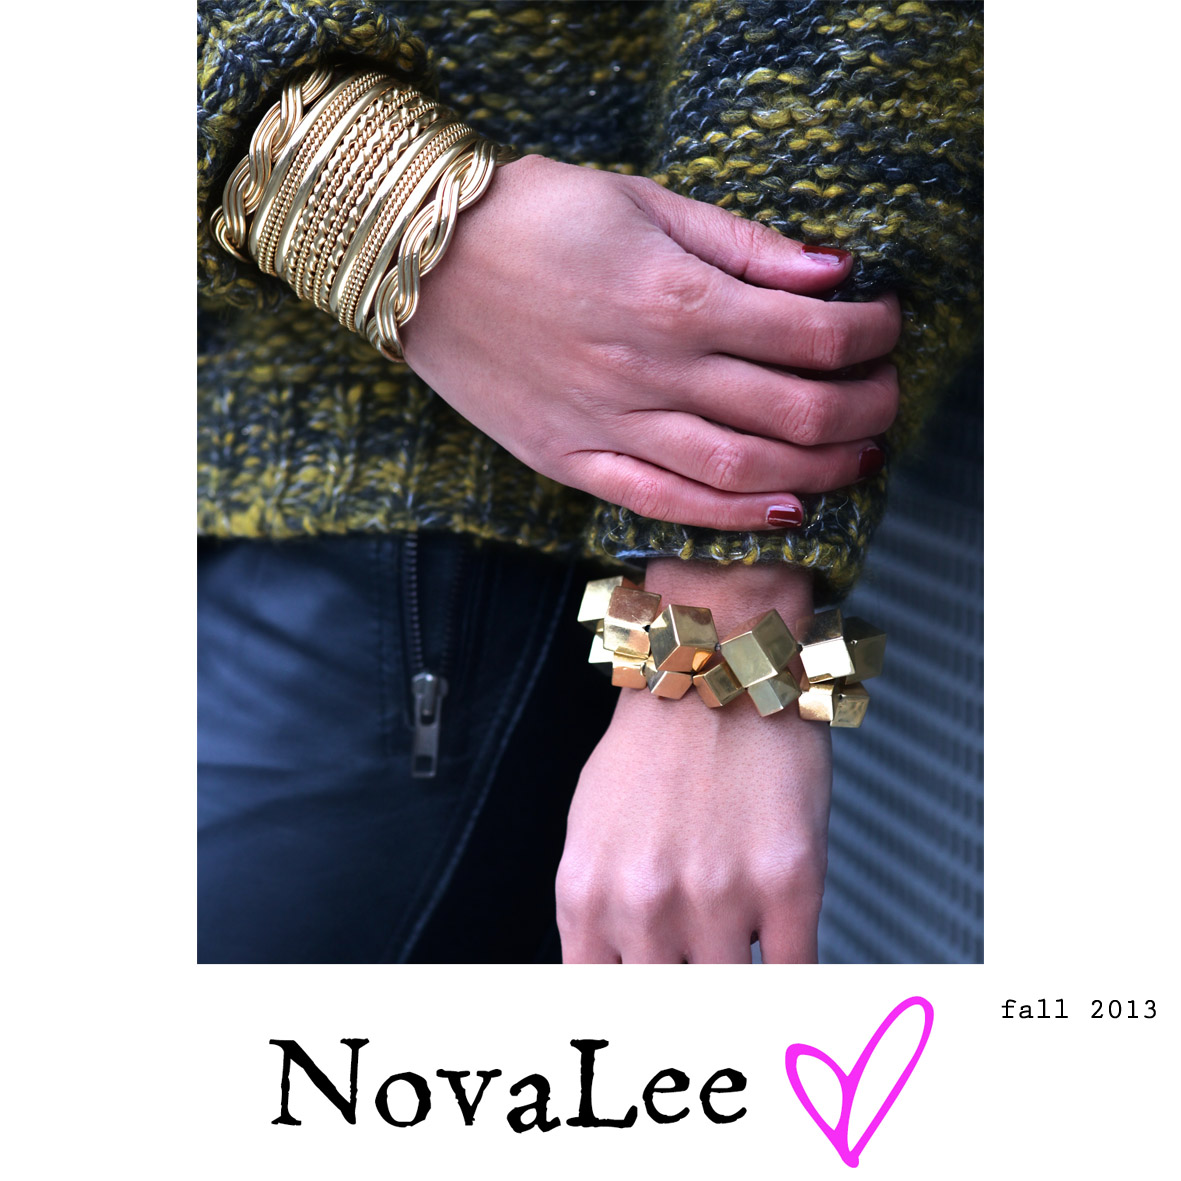 novalee fall 2013-04.jpg